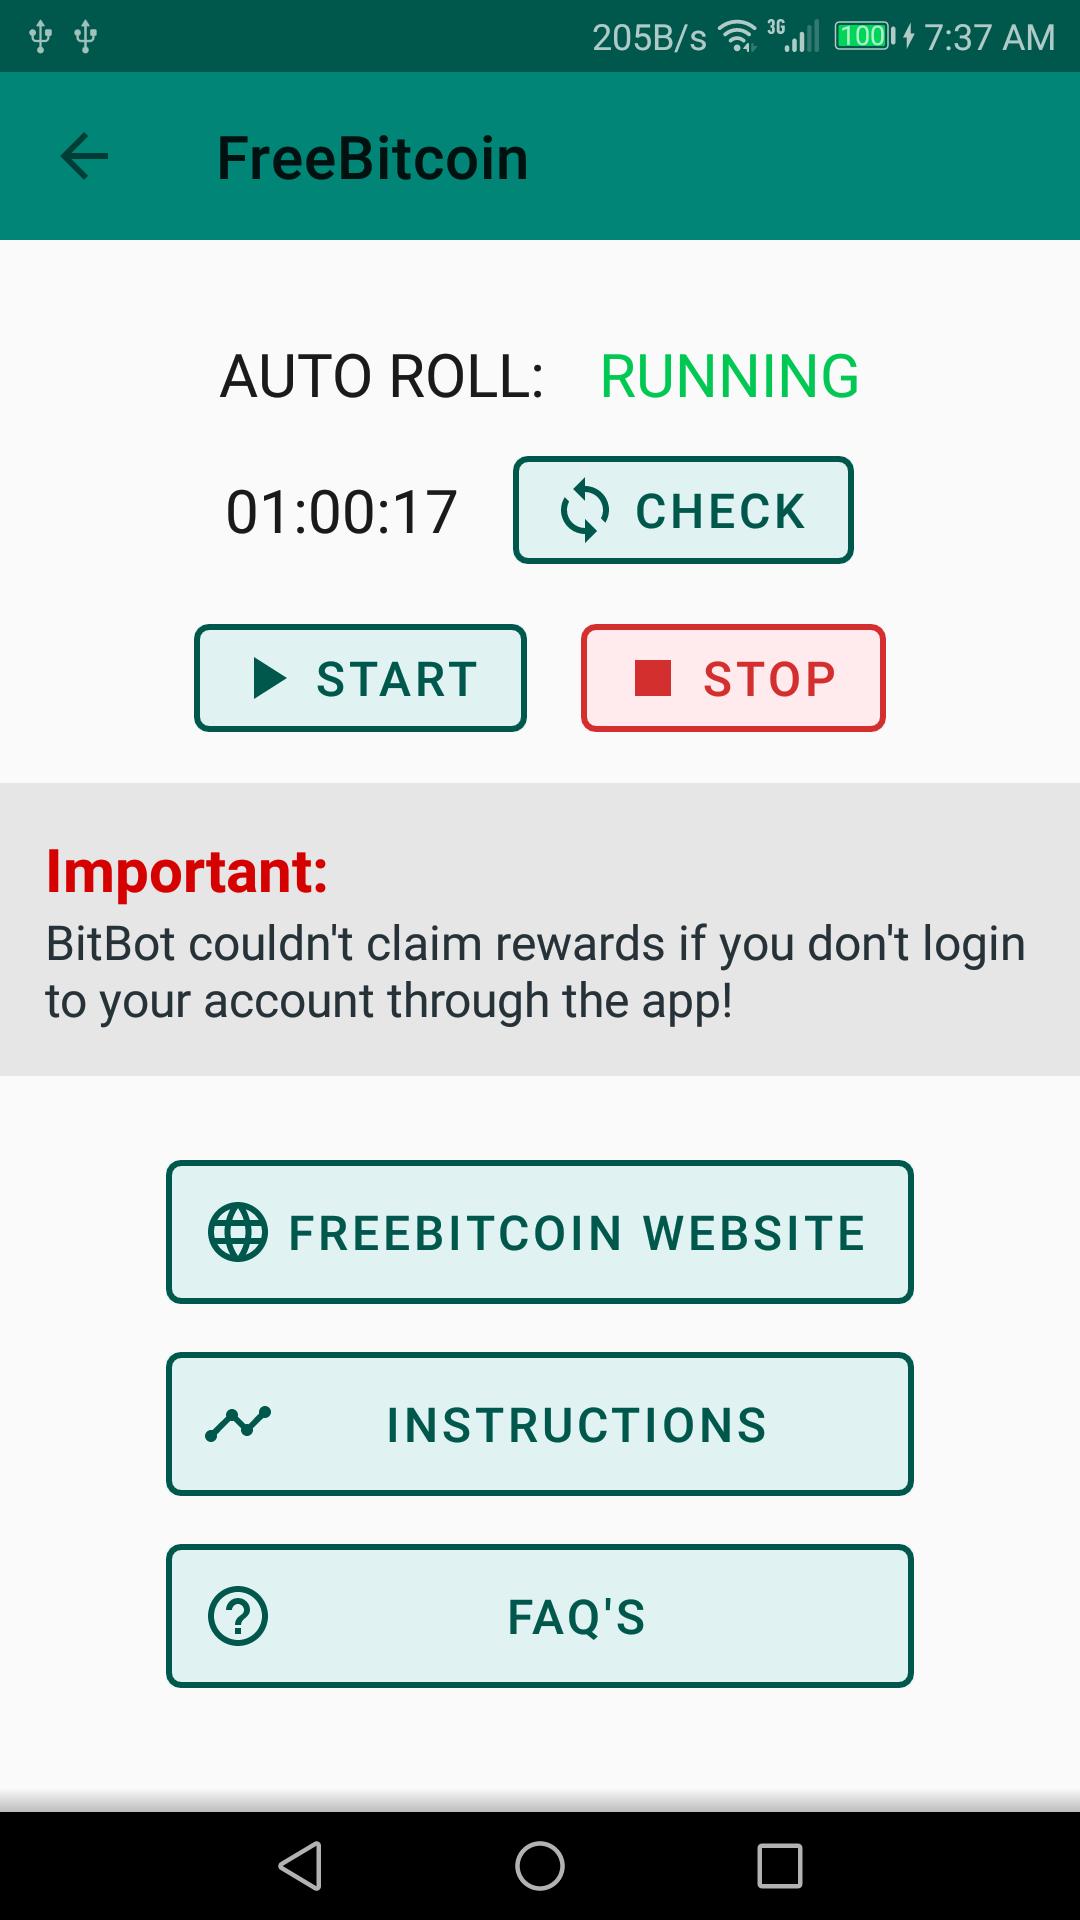 BitBot: FreeBitcoin Auto Roll Bot